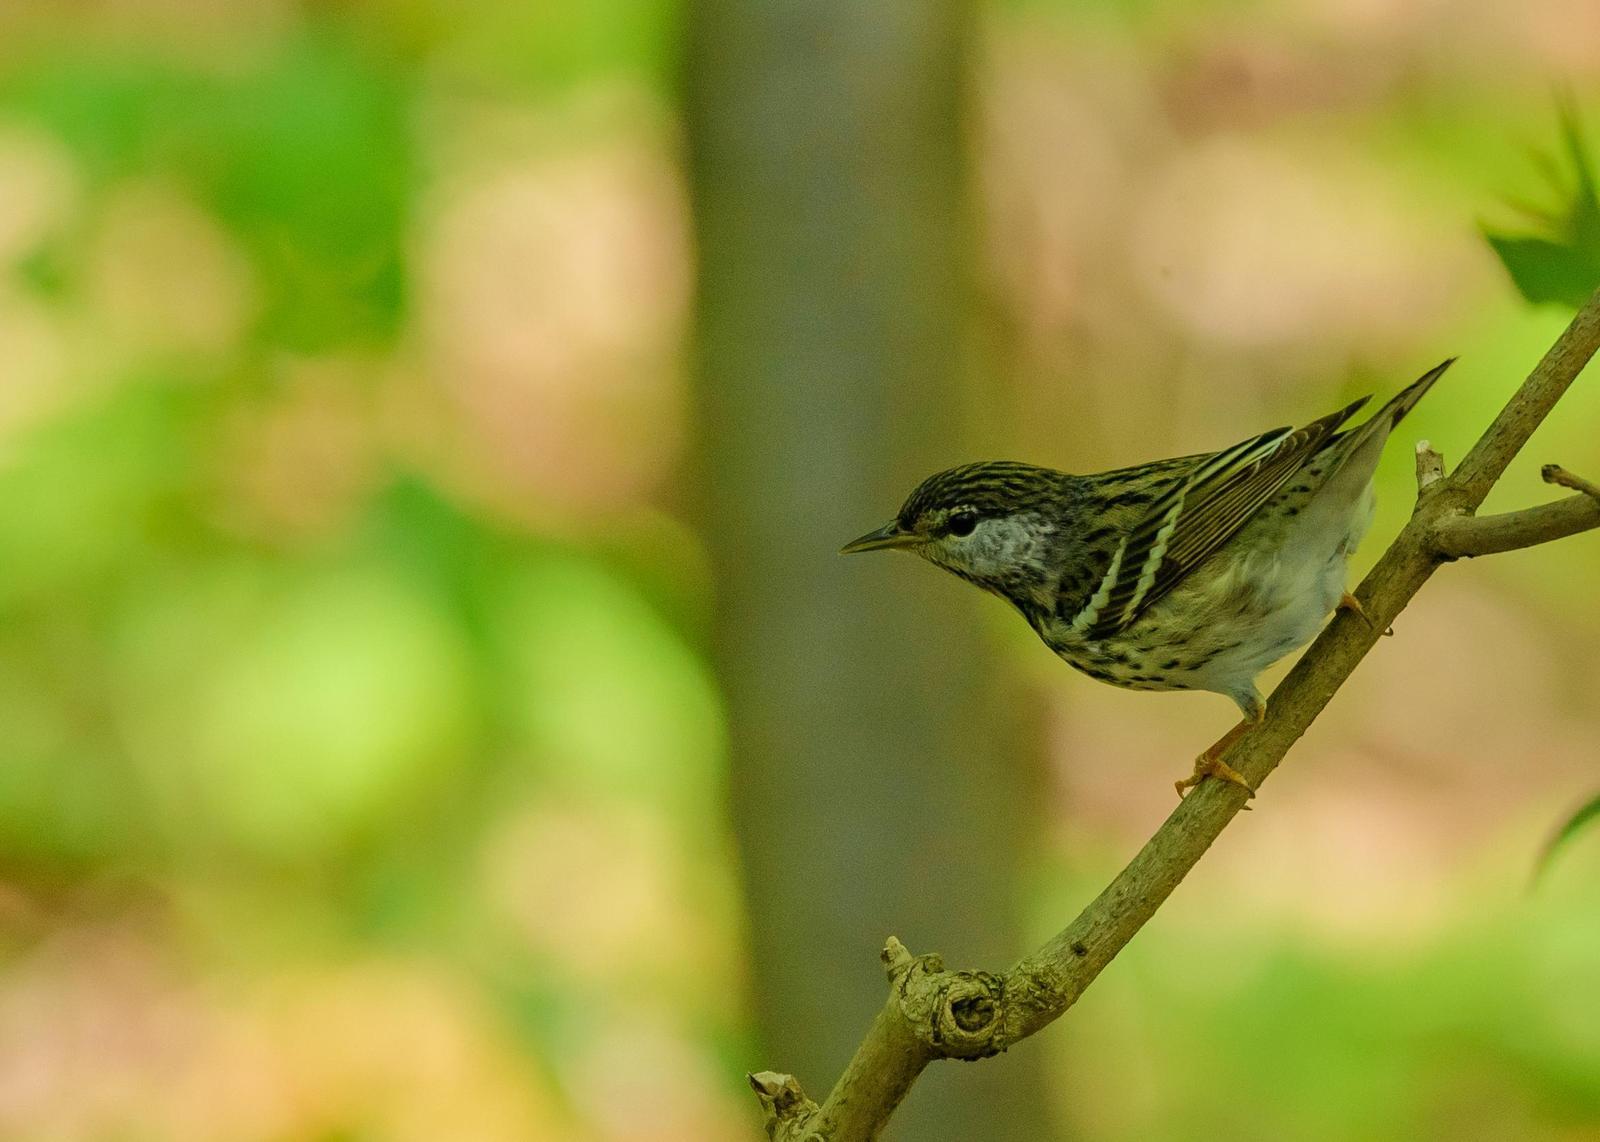 Blackpoll Warbler Photo by Keshava Mysore